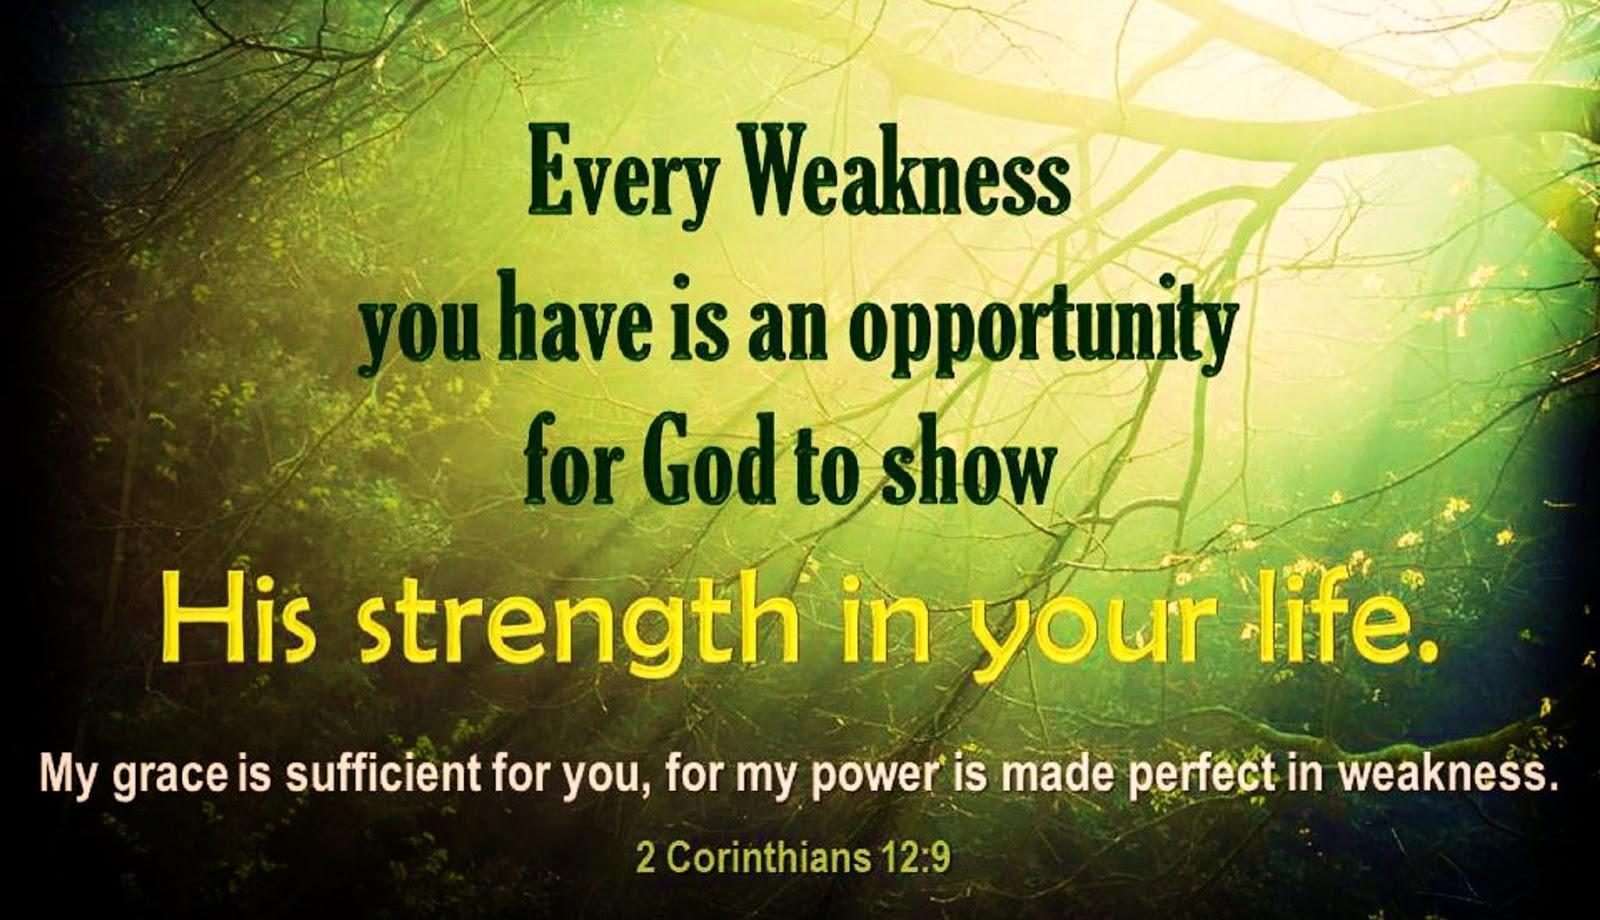 2_Corinthians_12.9_Bible_Verse.jpg